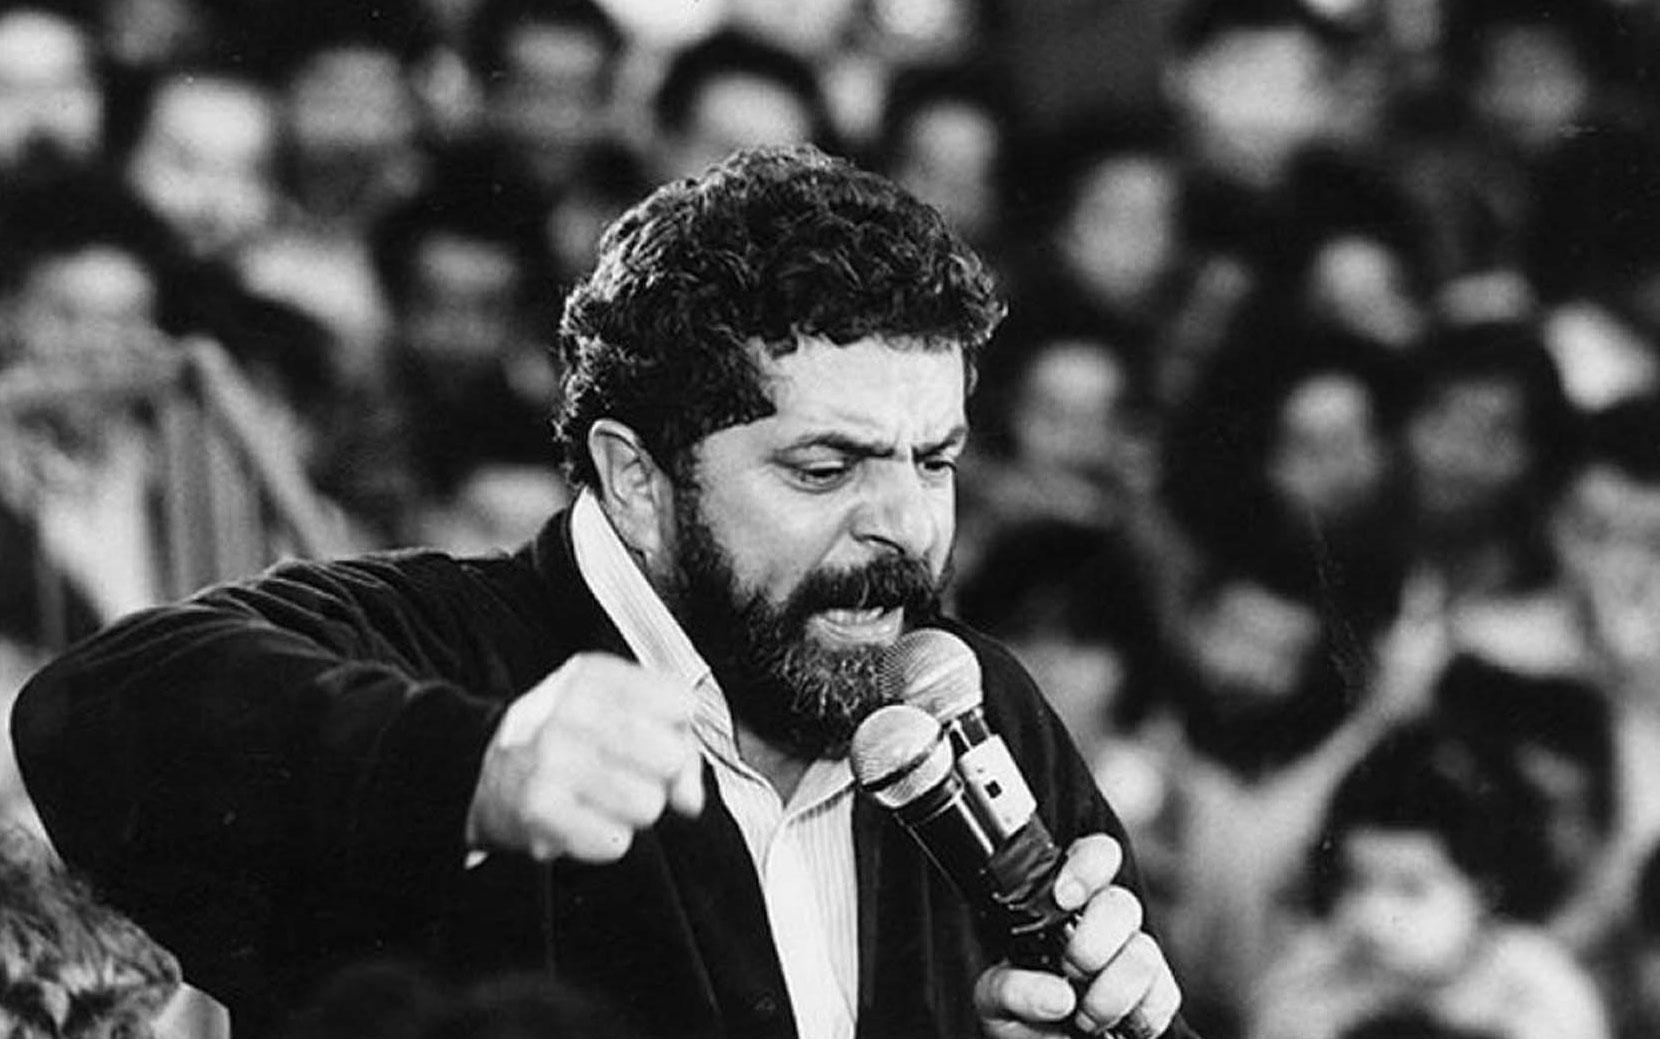 Expresidente Lula Da Silva pasó la noche en la cárcel — Brasil